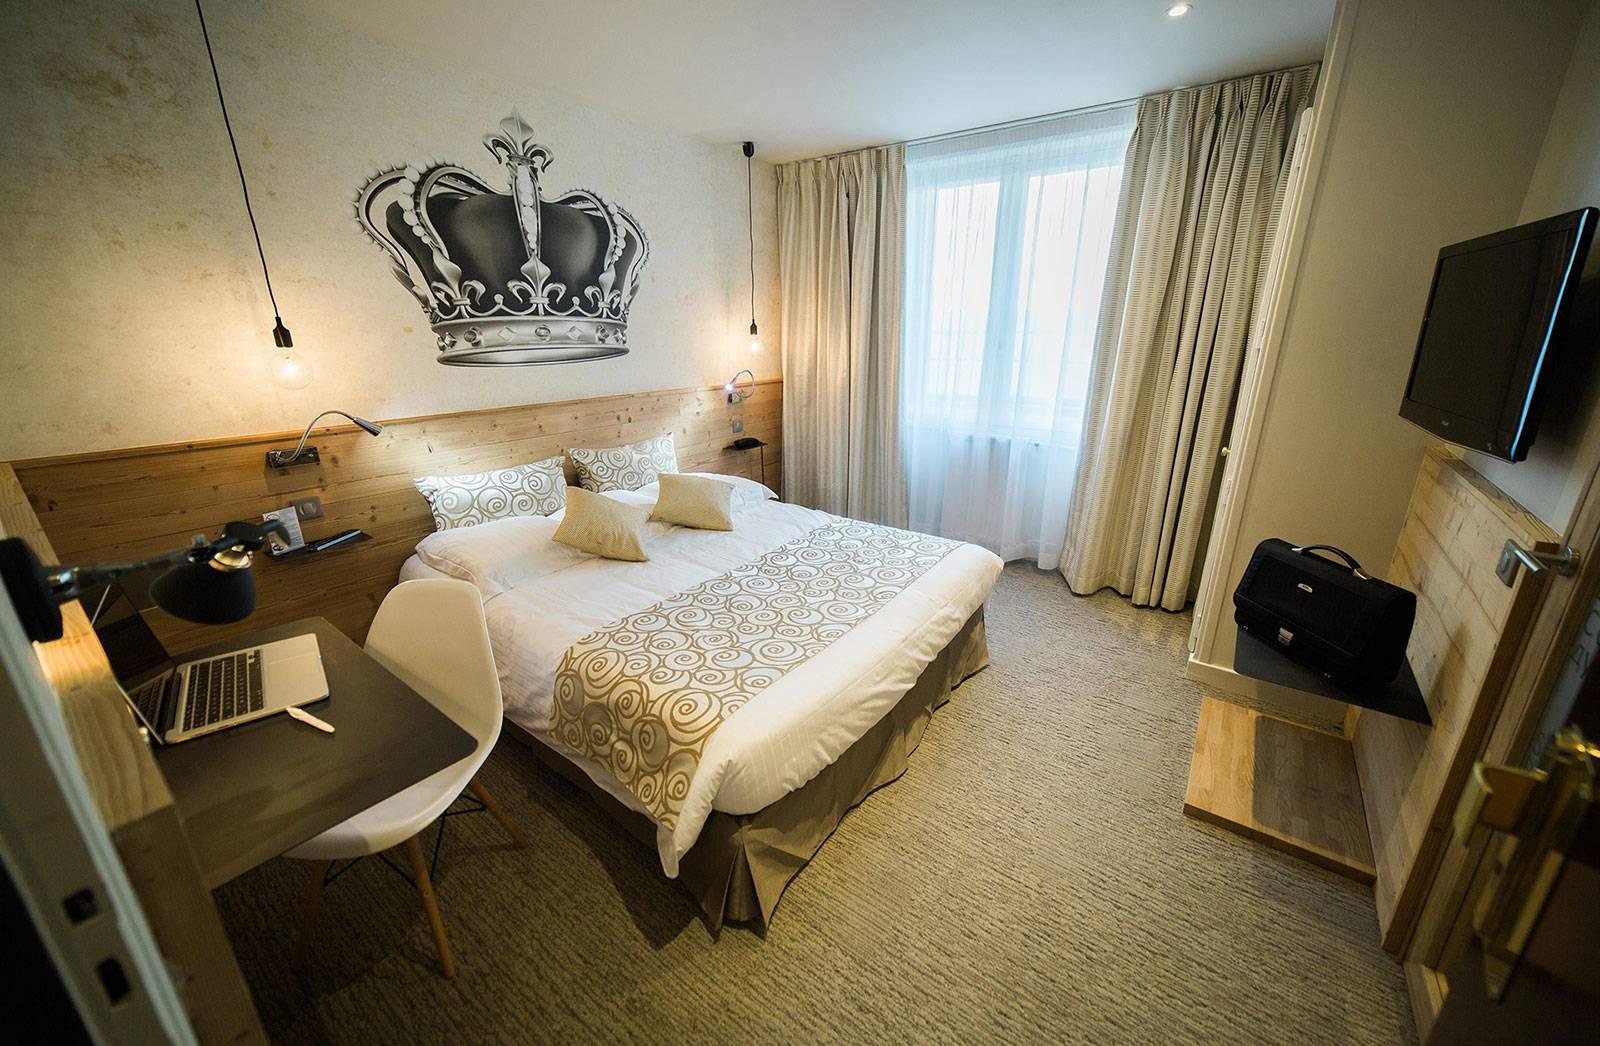 chambre h tel chamb ry centre chalet h tel des princes. Black Bedroom Furniture Sets. Home Design Ideas